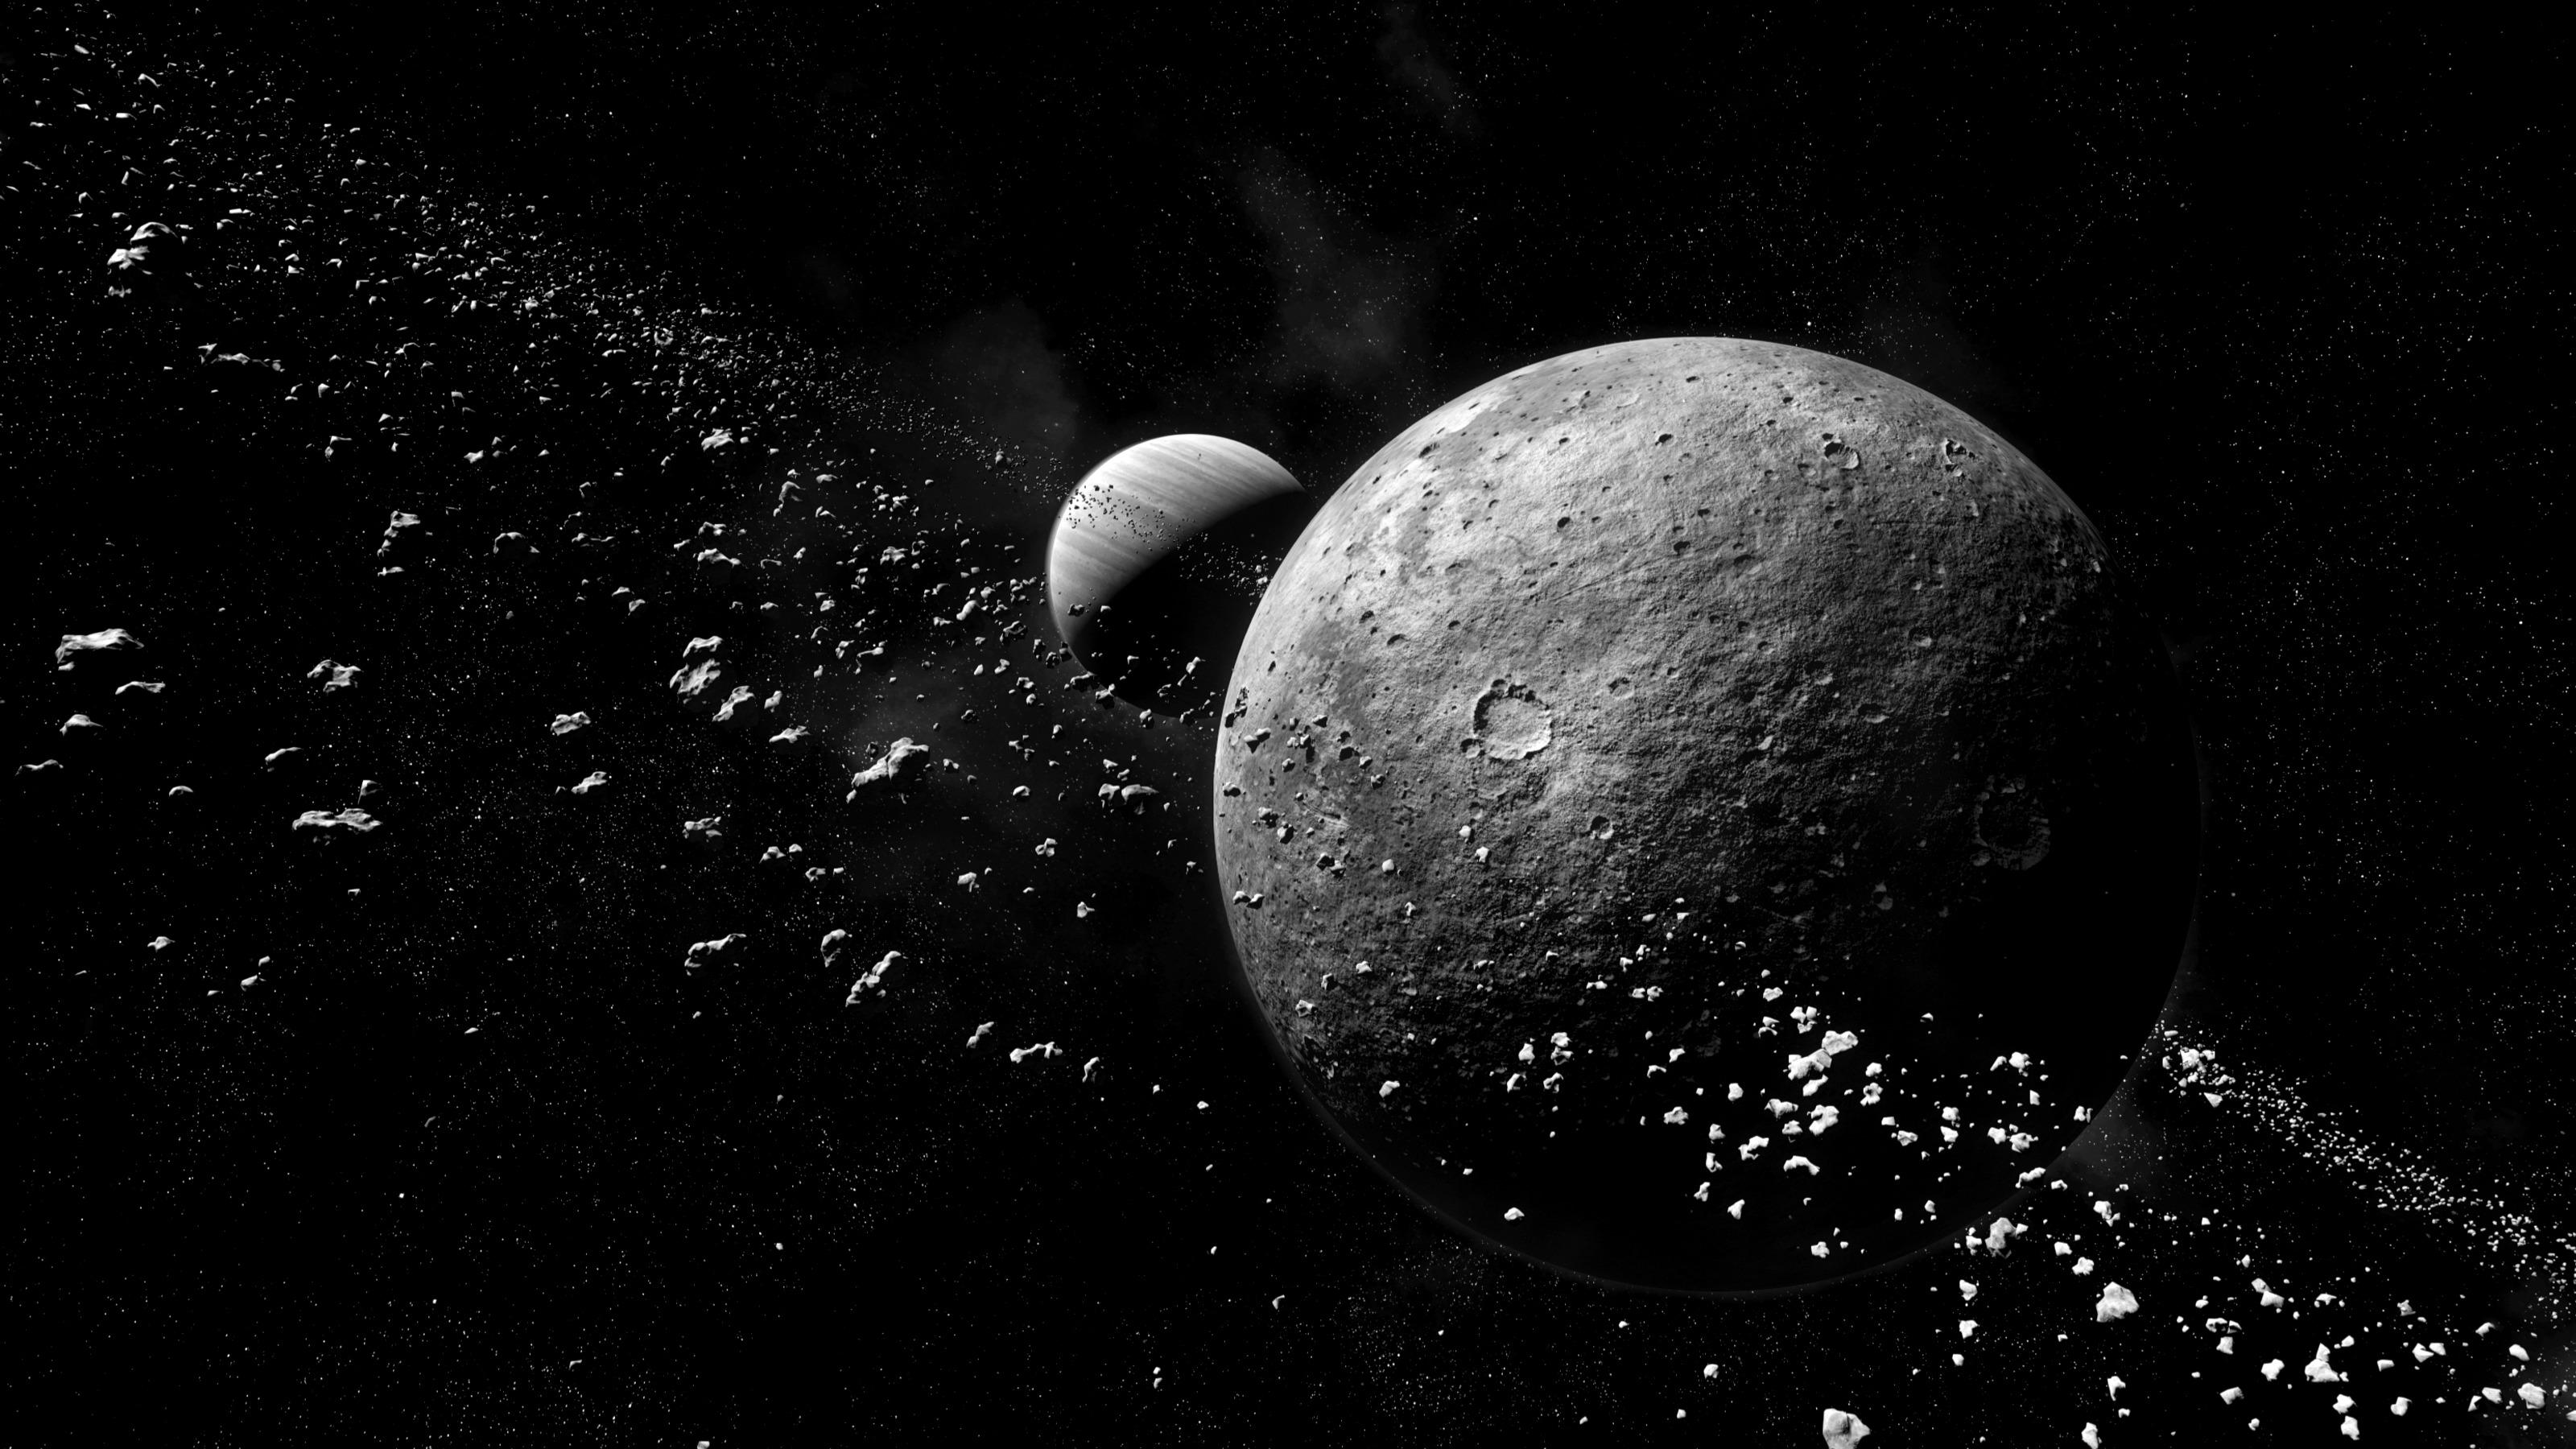 Planet hd wallpaper background image 3200x1800 id - 3200x1800 wallpaper ...